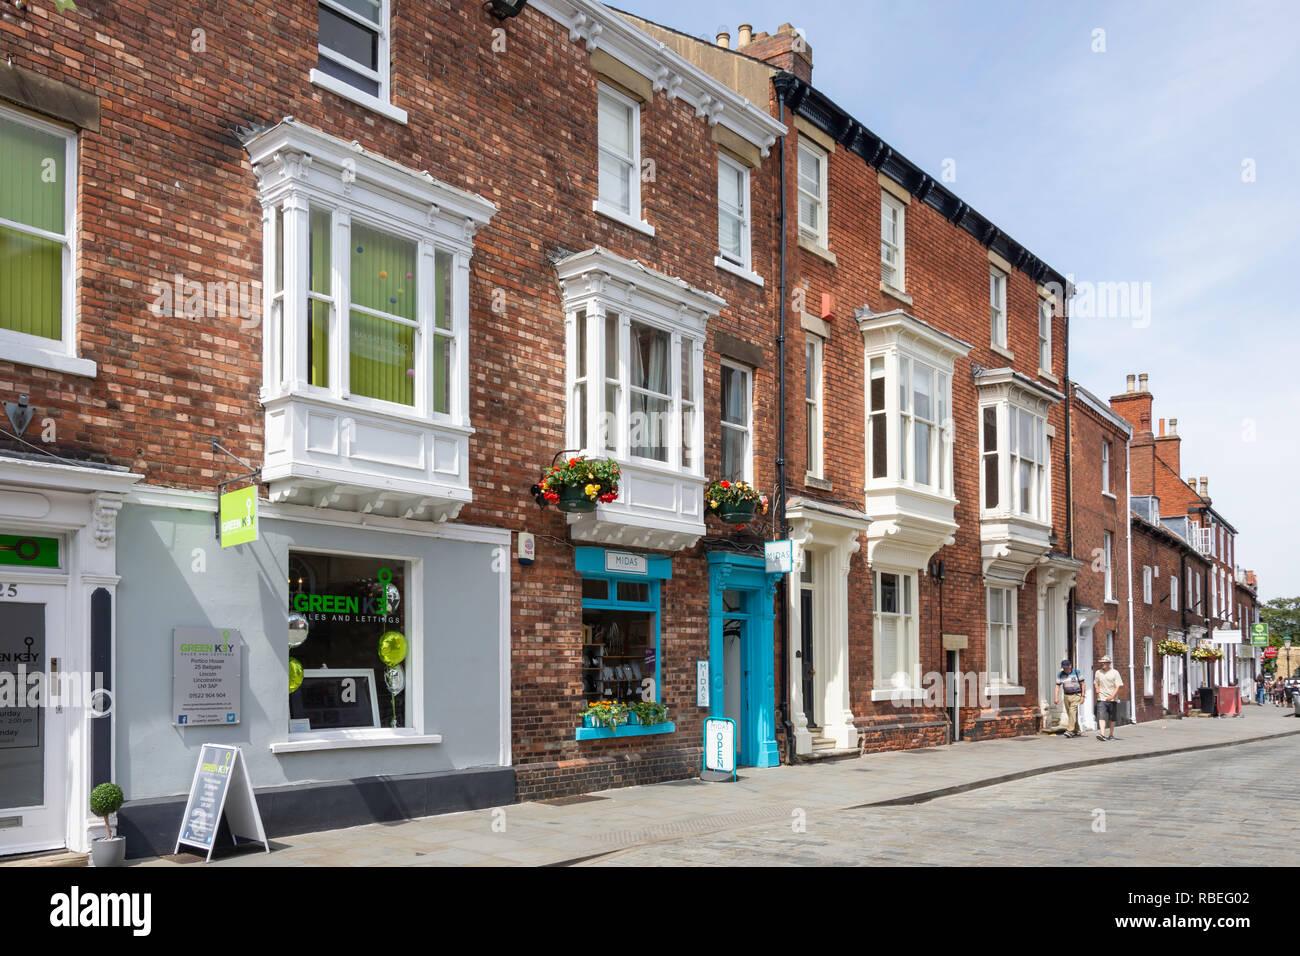 Period buildings, Bailgate, Lincoln, Lincolnshire, England, United Kingdom - Stock Image